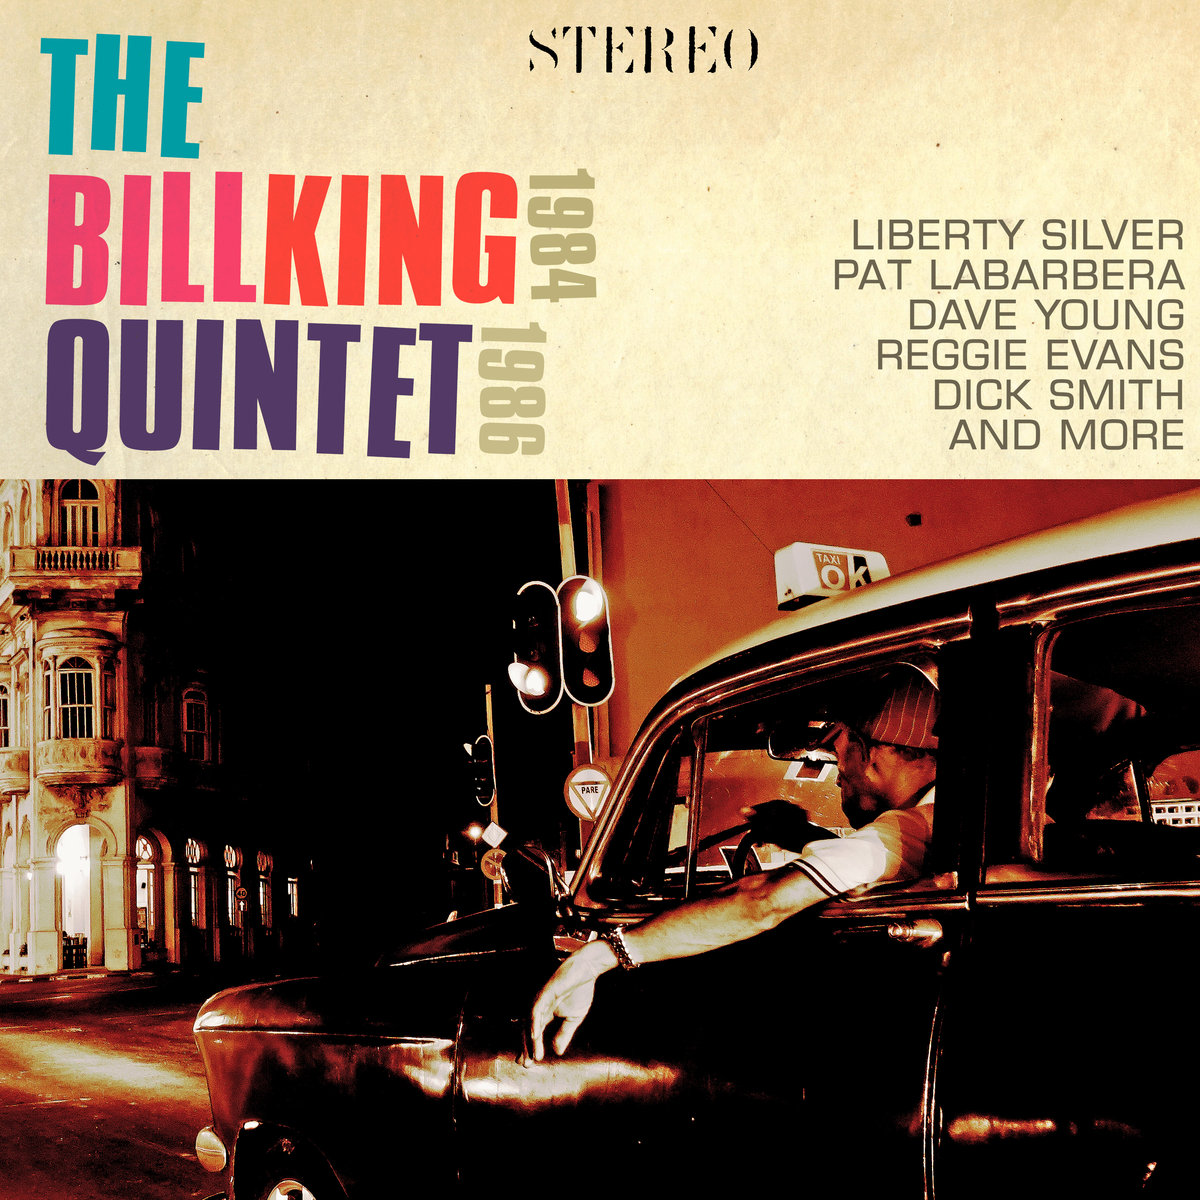 Bill King Quintet | Night Passage Years – 1984-1986